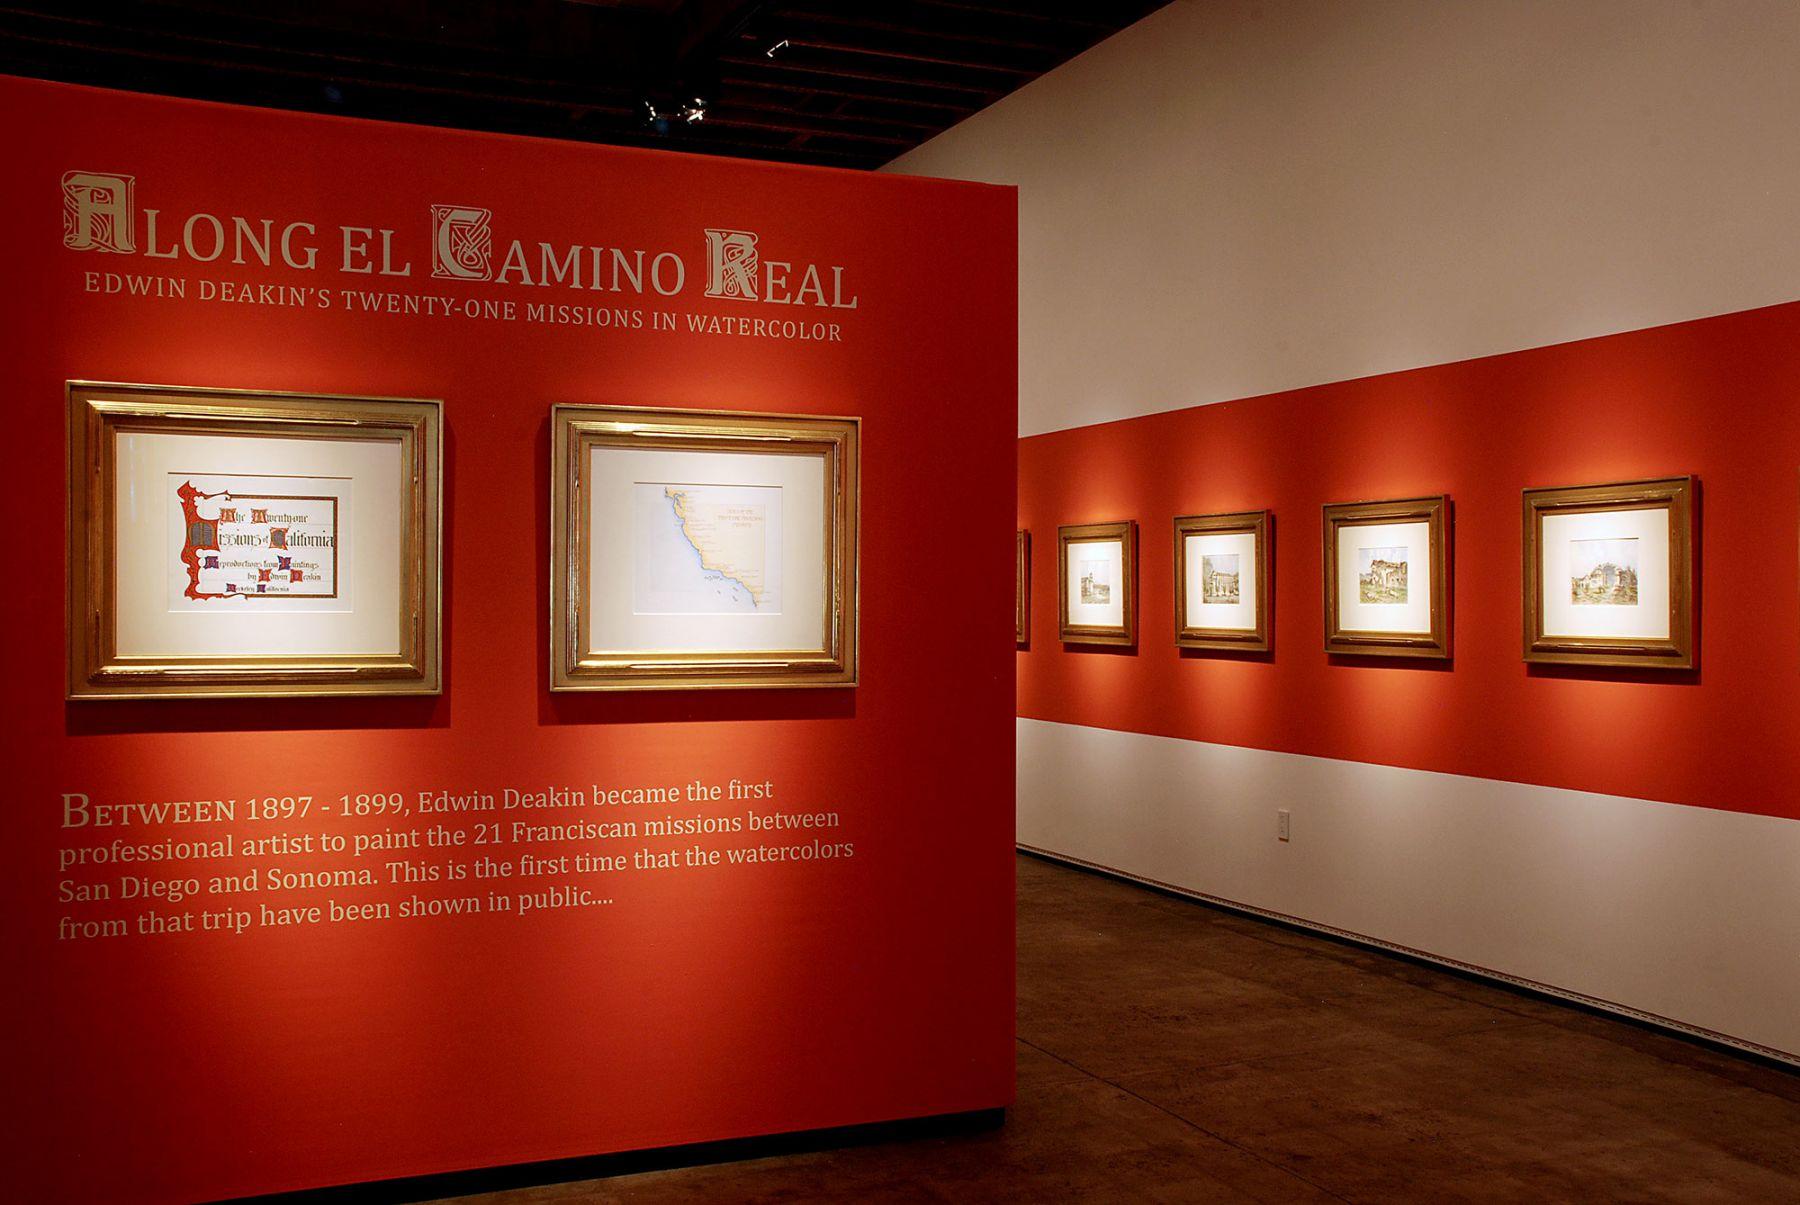 ALONG EL CAMINO REAL: Edwin Deakin's 21 Missions in Watercolor installation